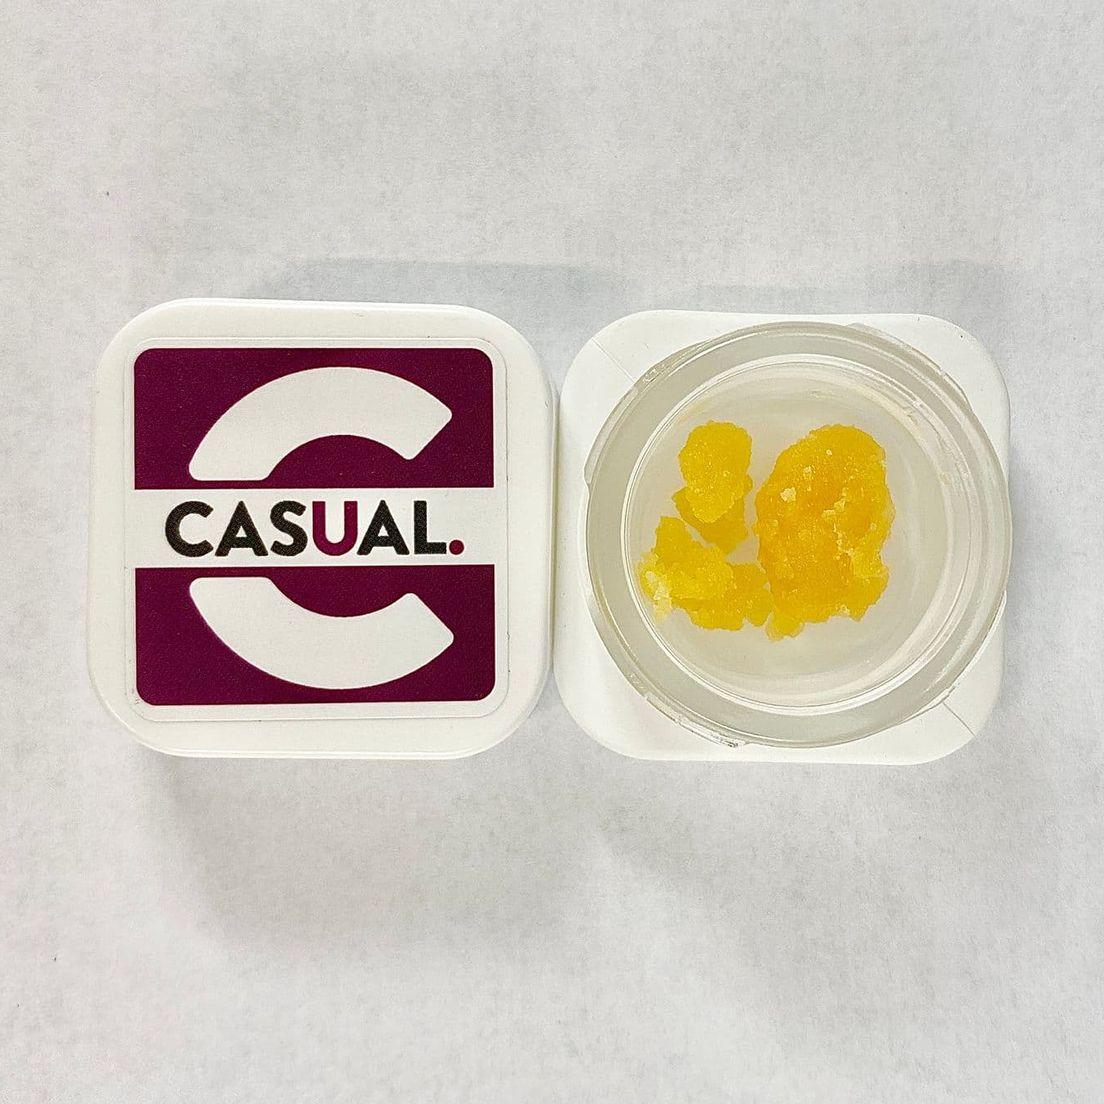 (PRE-ORDER ONLY) OG Cookies - 1g Sugar (80.5%) Casual